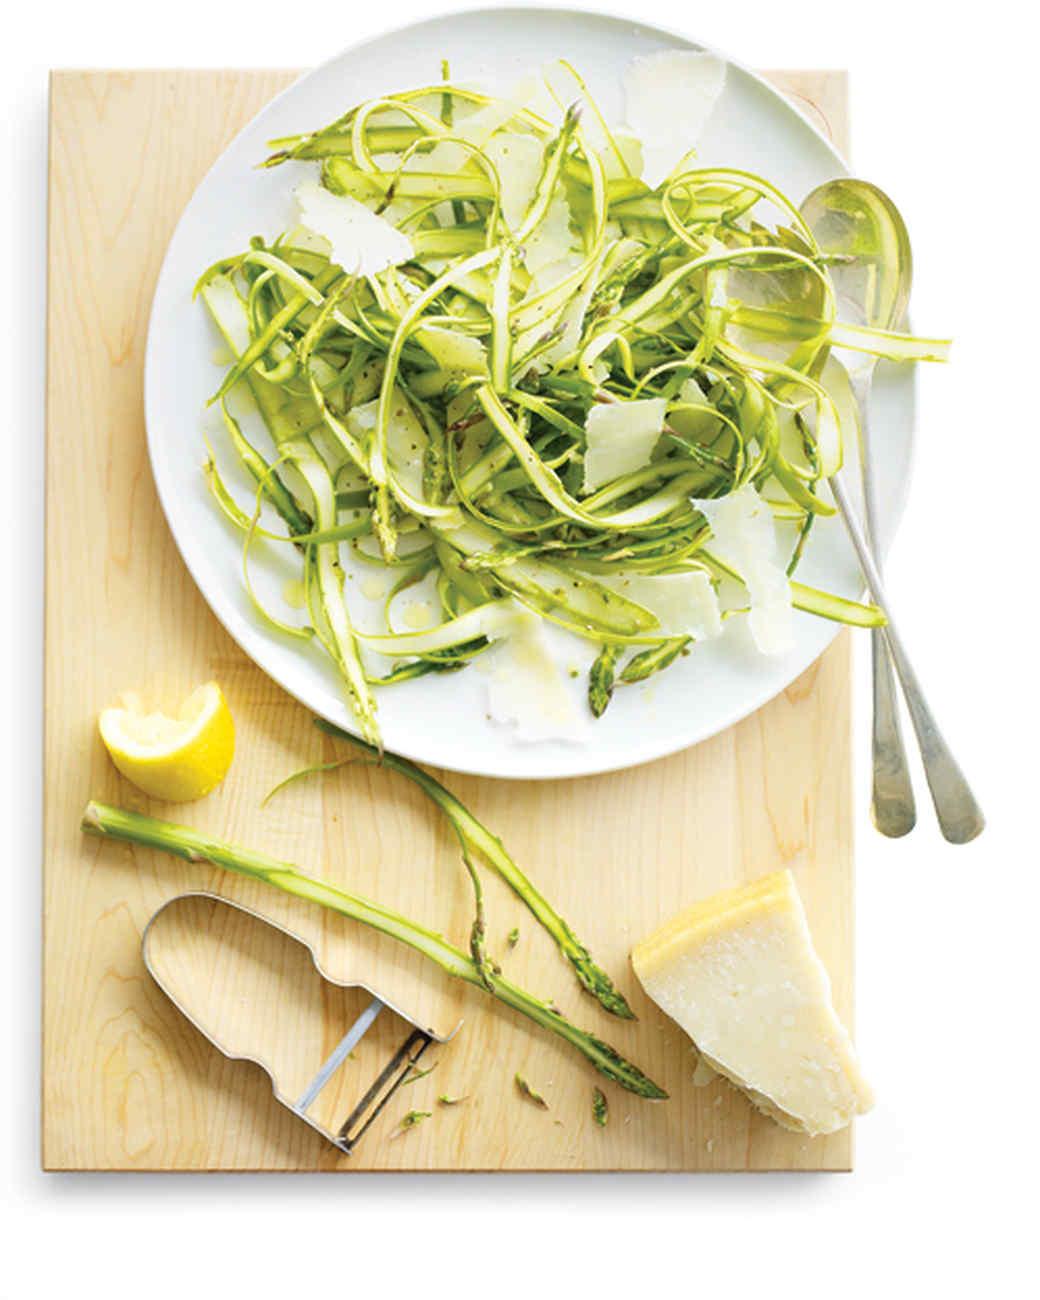 mld105024_0510_asparagus1.jpg